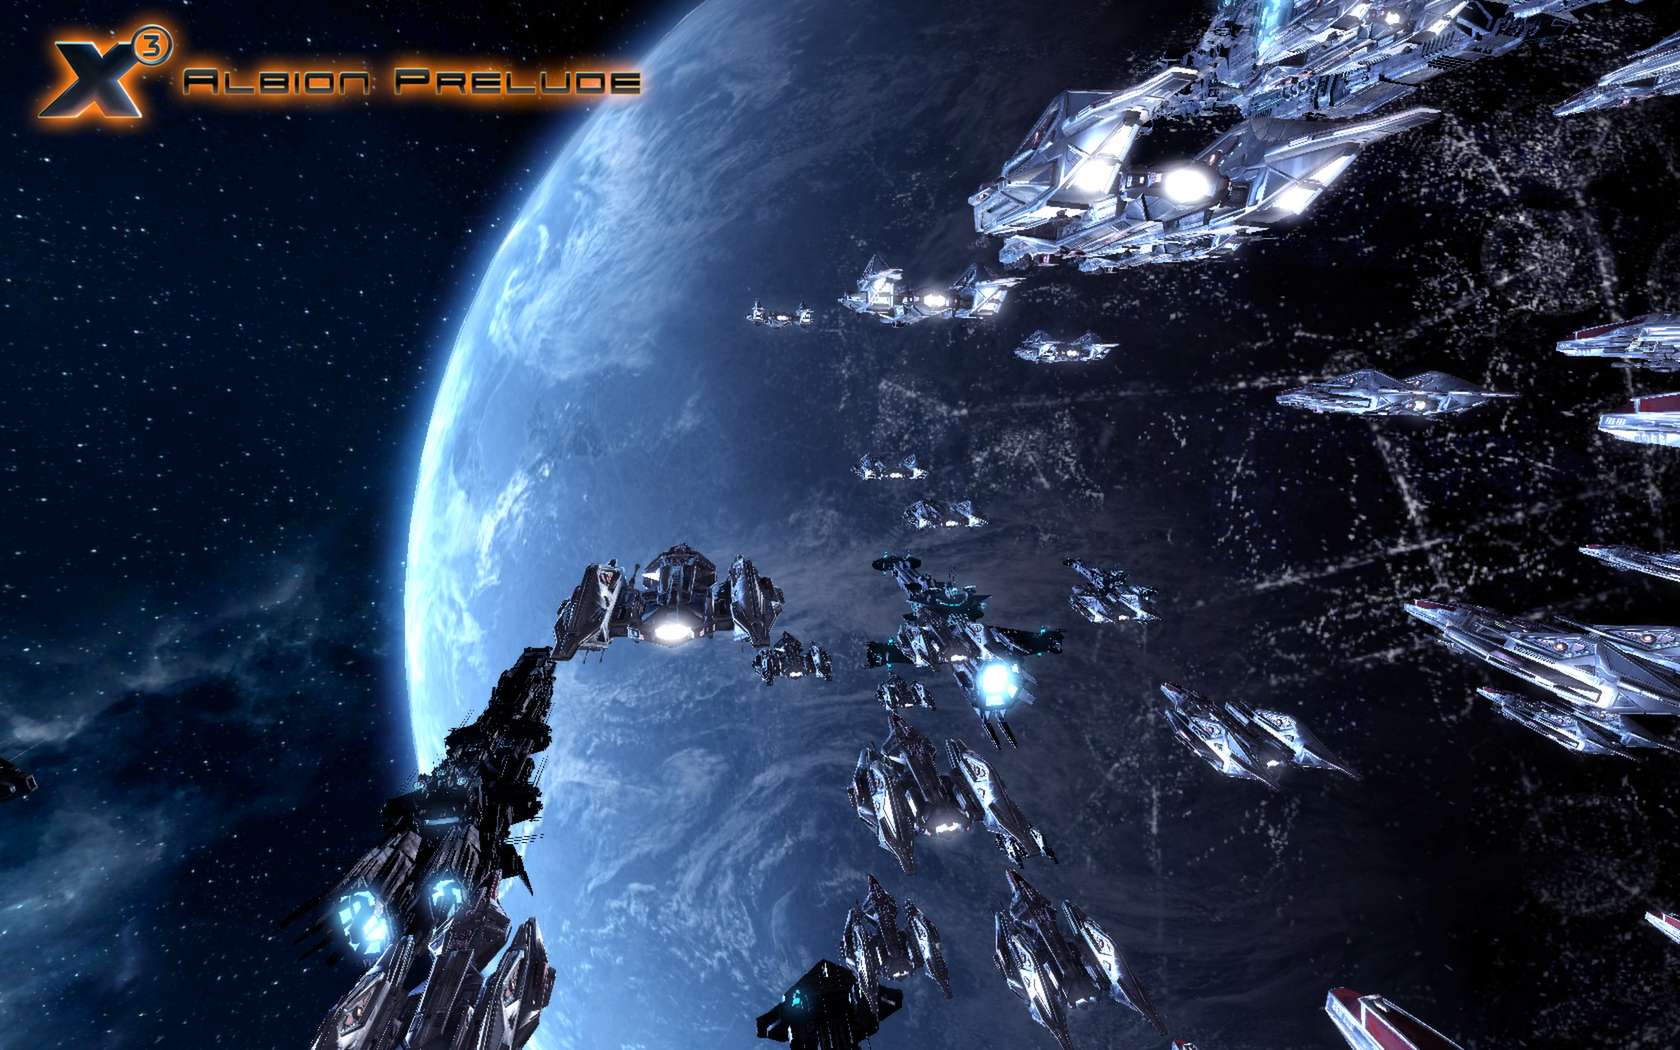 X3: Albion Prelude Screenshot 3